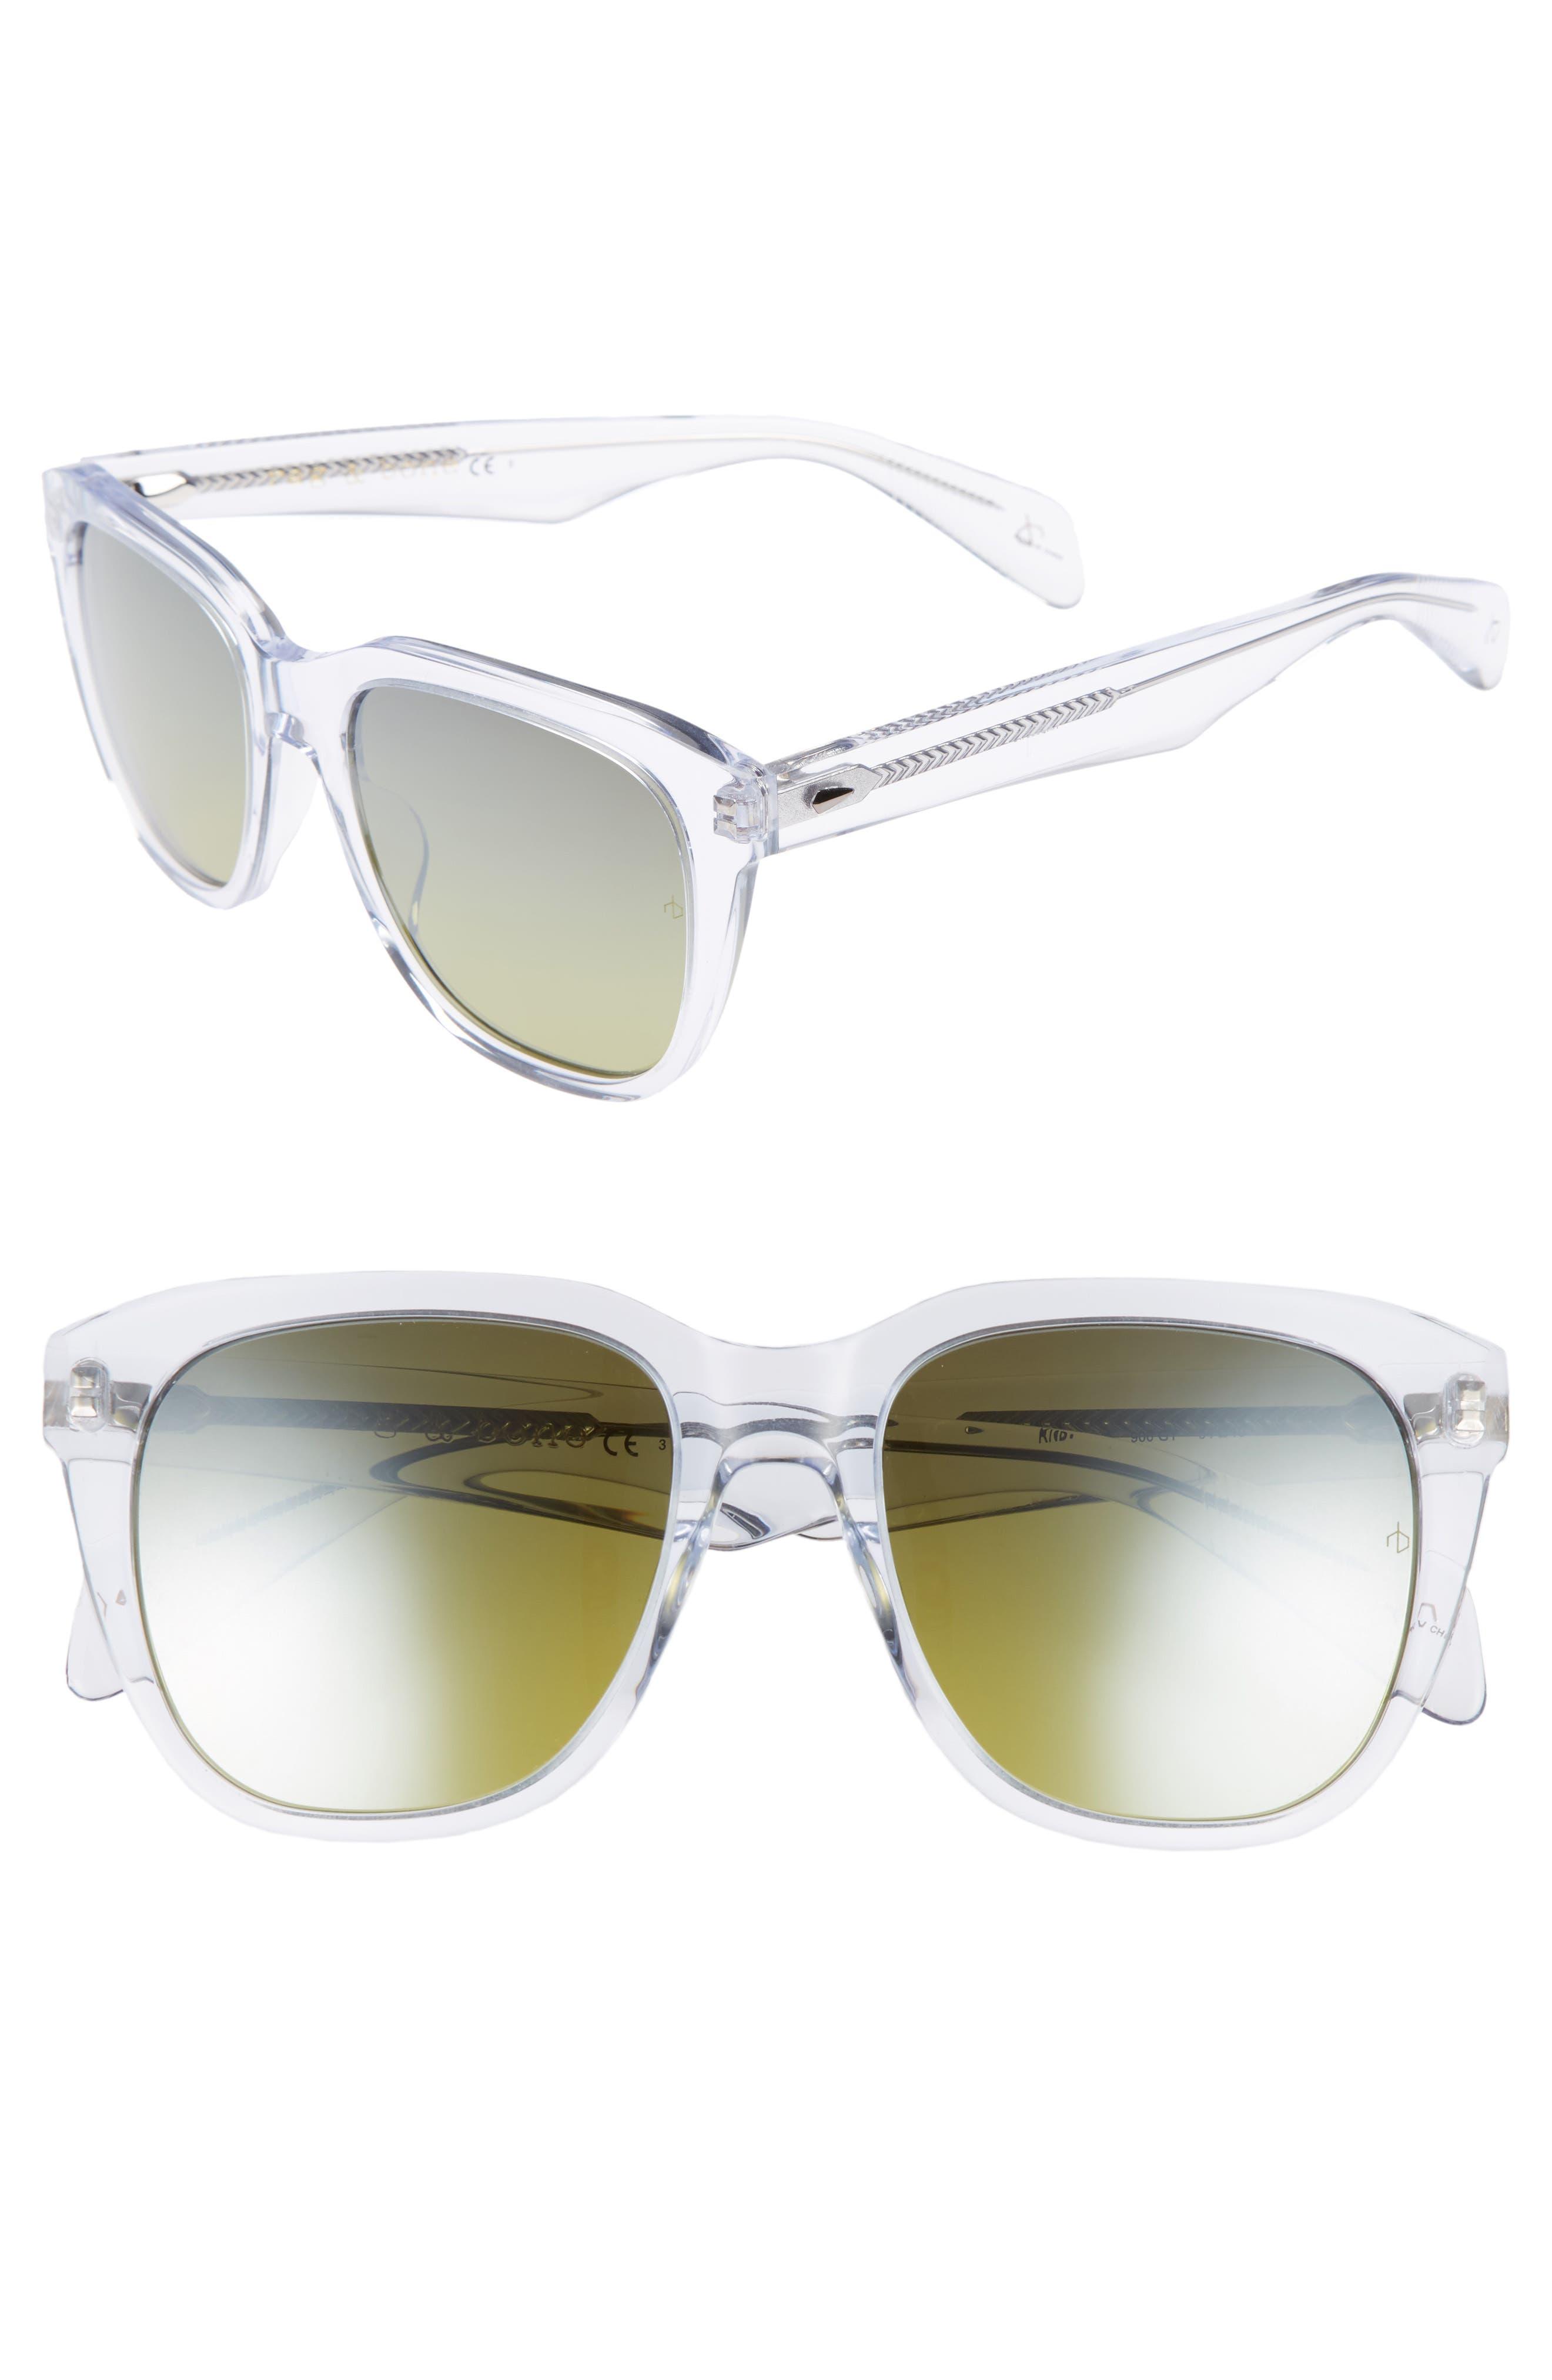 54mm Mirrored Sunglasses,                             Main thumbnail 1, color,                             Crystal